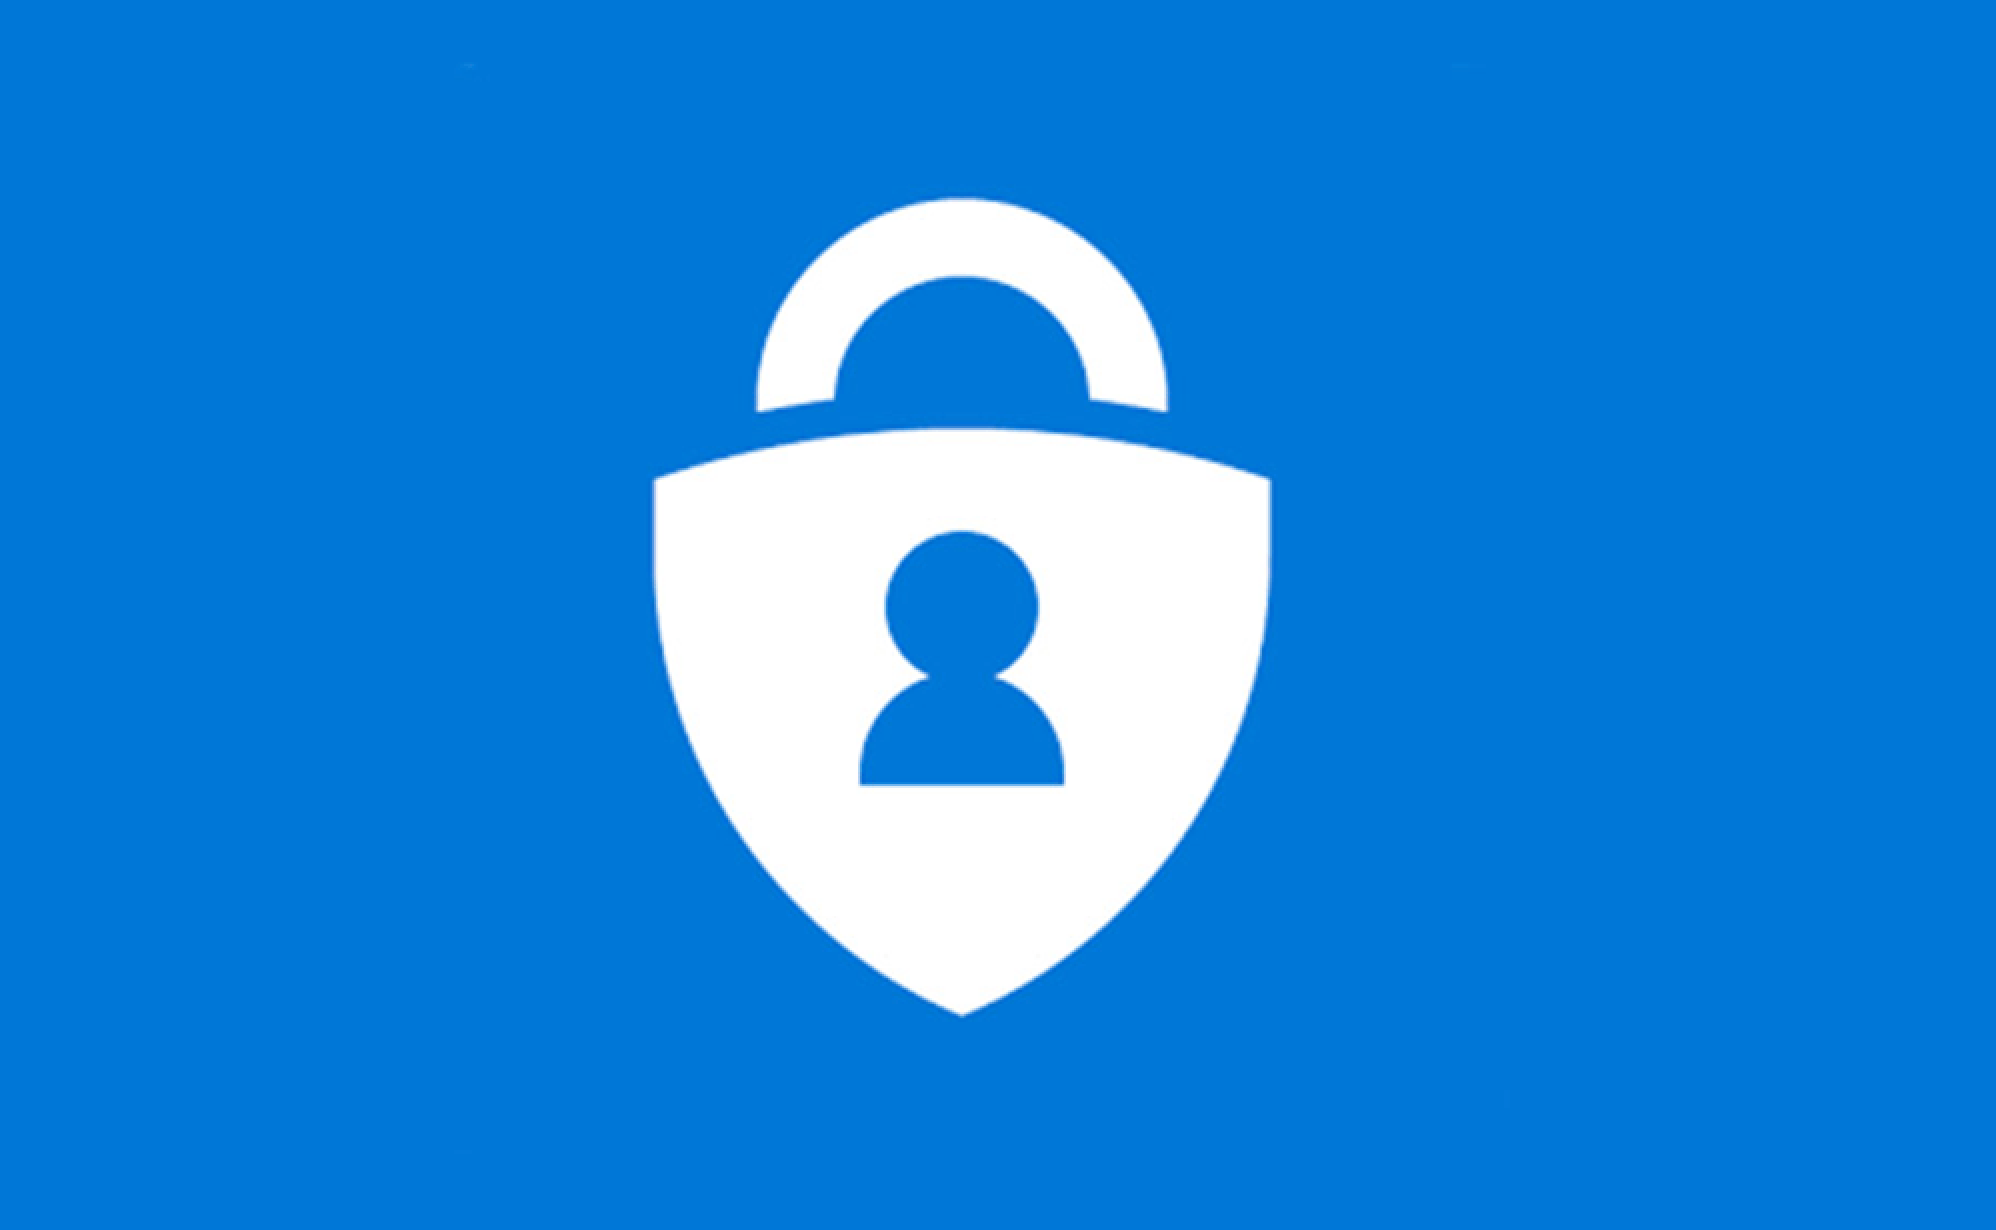 The Microsoft Authenticator logo